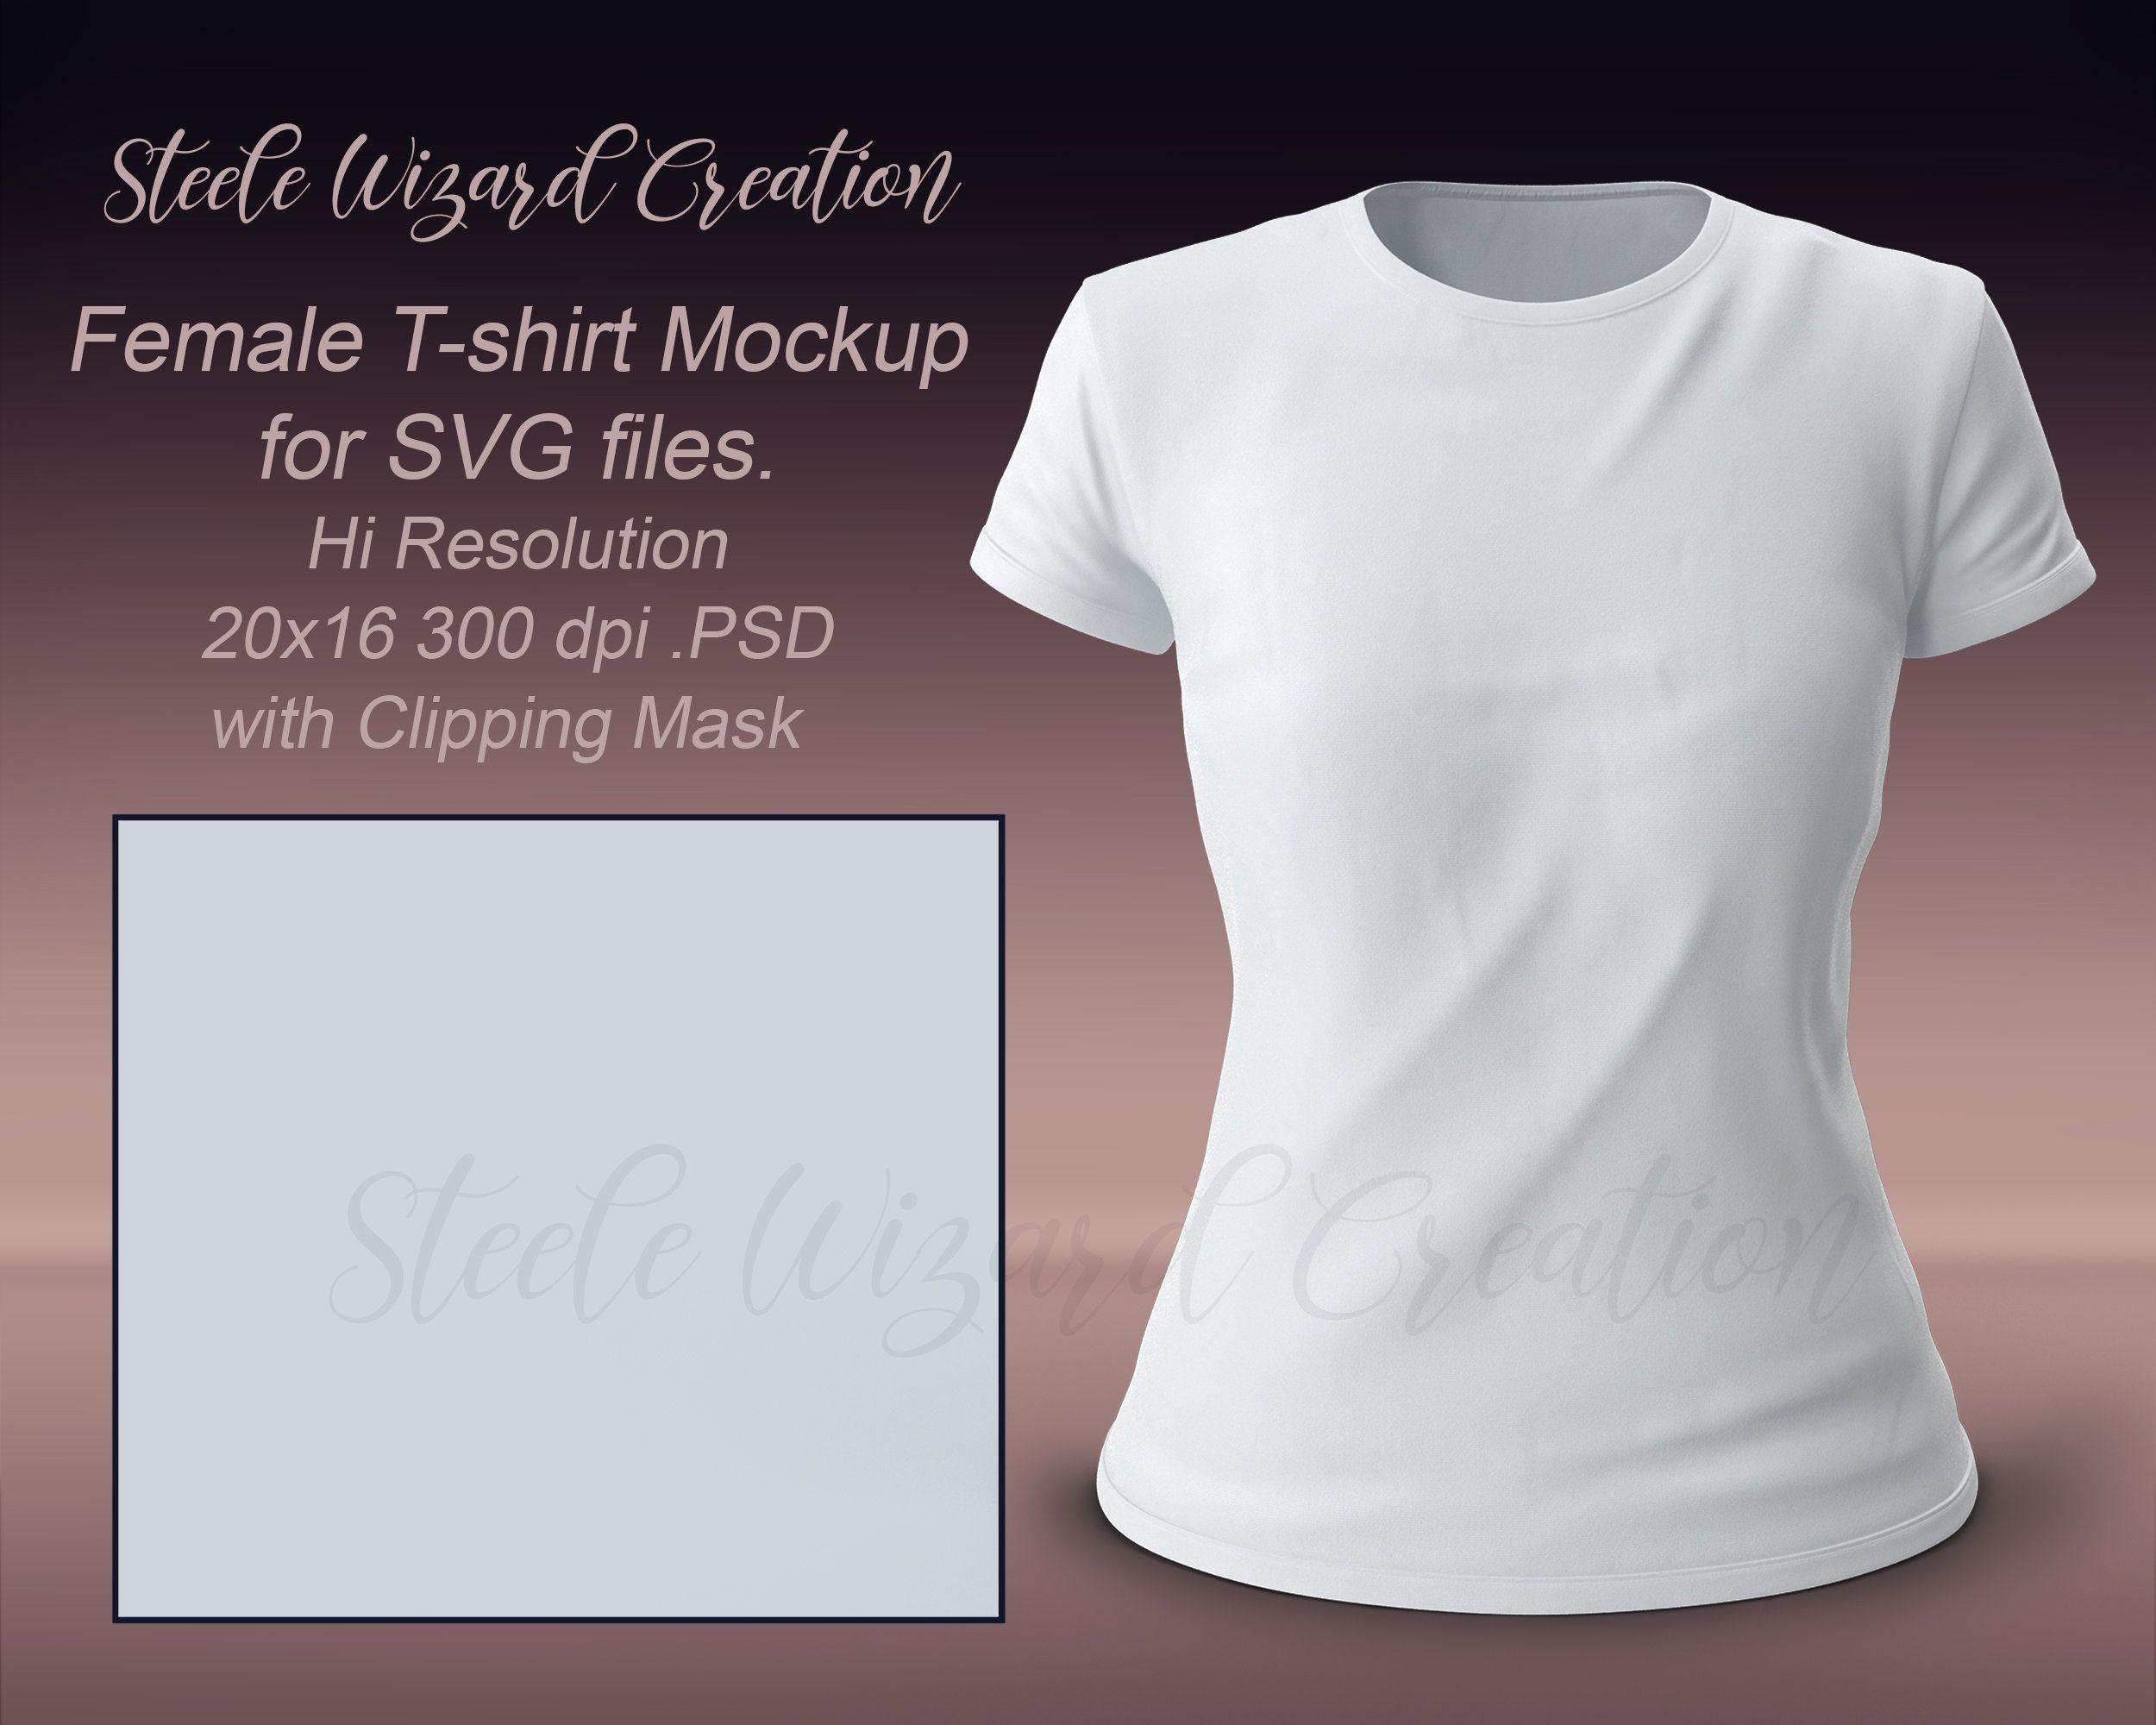 Download White T Shirt Mockup Female Mockup Shirt T Shirt Mockup Etsy Tshirt Mockup Shirt Mockup Mockup